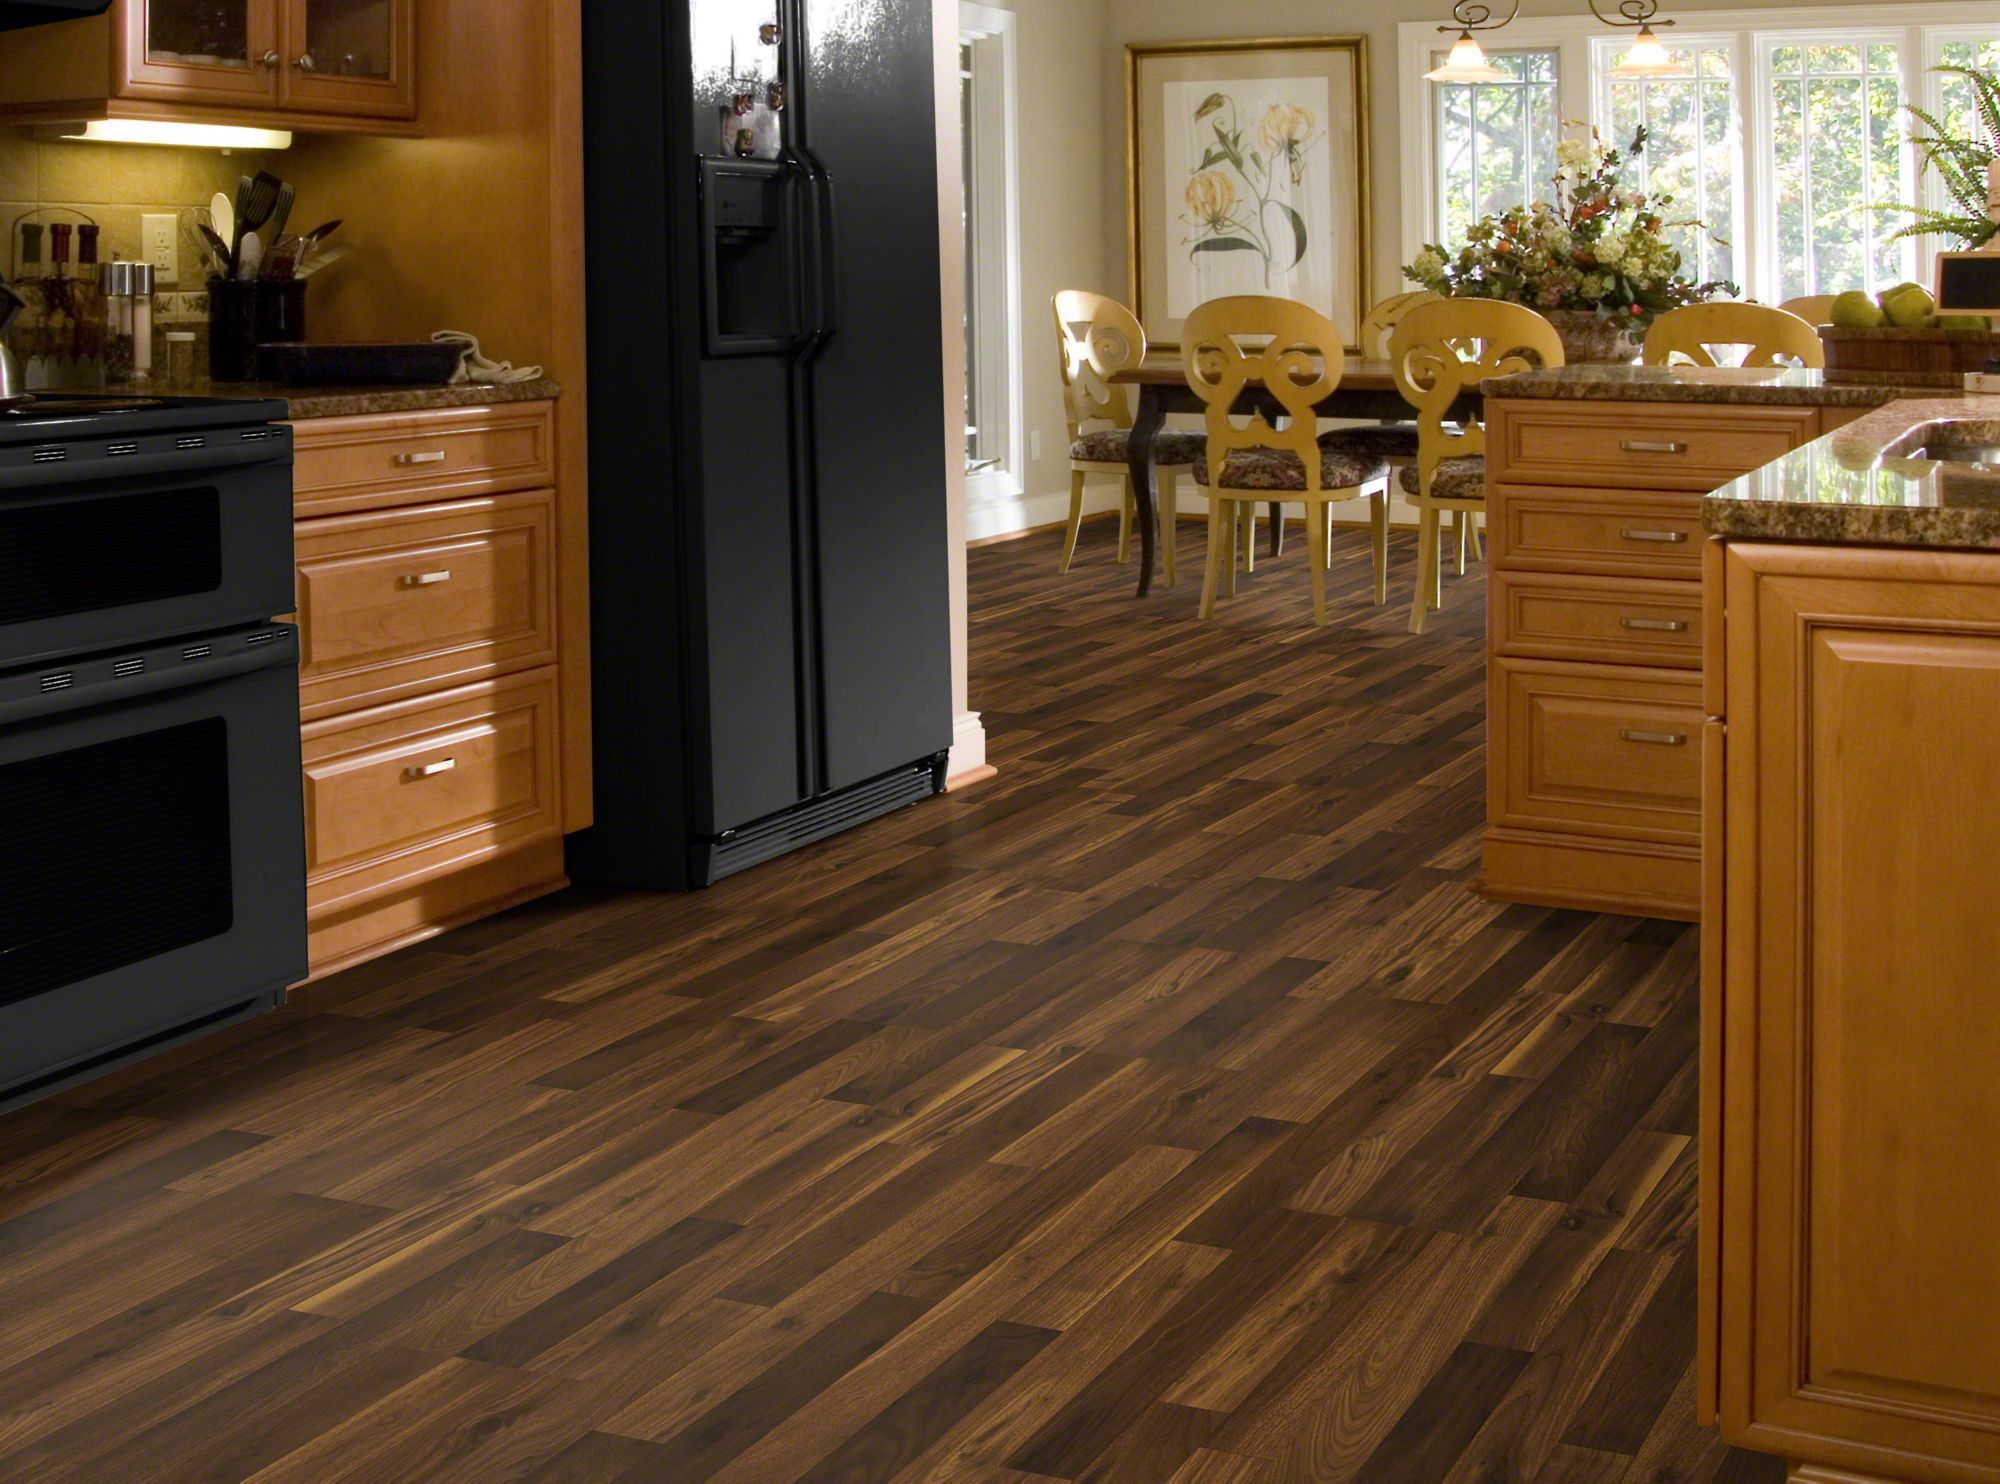 SL Room View Flooring Pinterest Room Kitchen Room - Cost of shaw laminate flooring